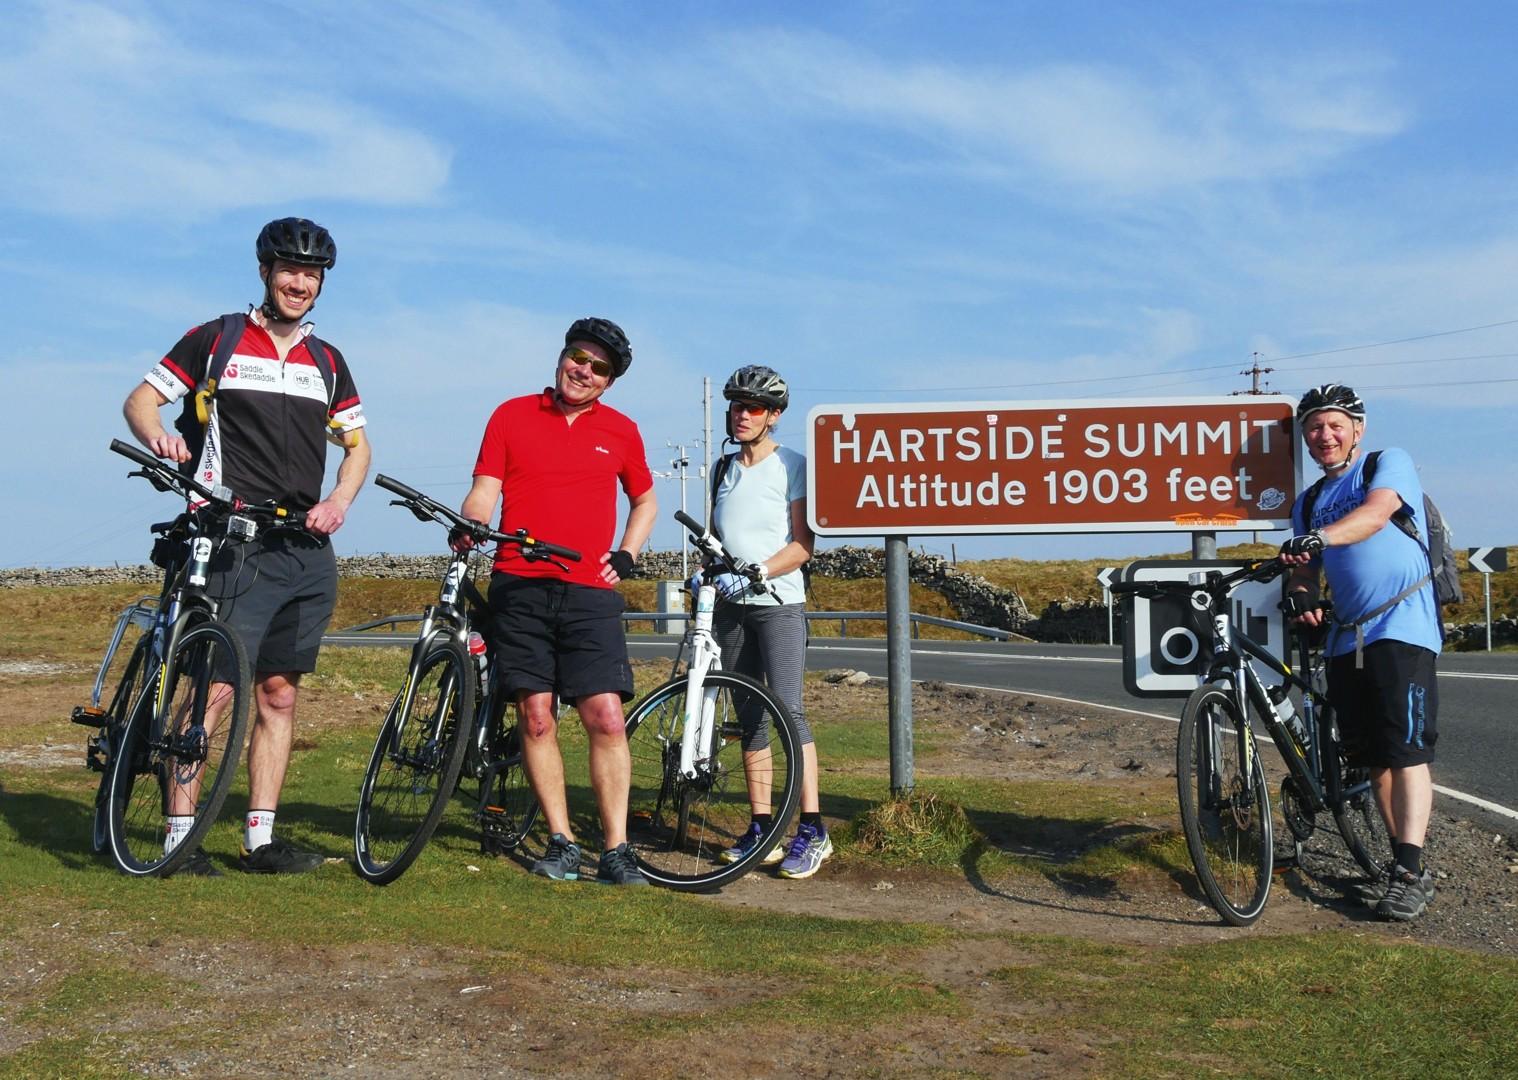 cycling-holiday-c2c-landscape-summit.jpg - UK - C2C - Coast to Coast 5 Days Cycling - Self-Guided Leisure Cycling Holiday - Leisure Cycling